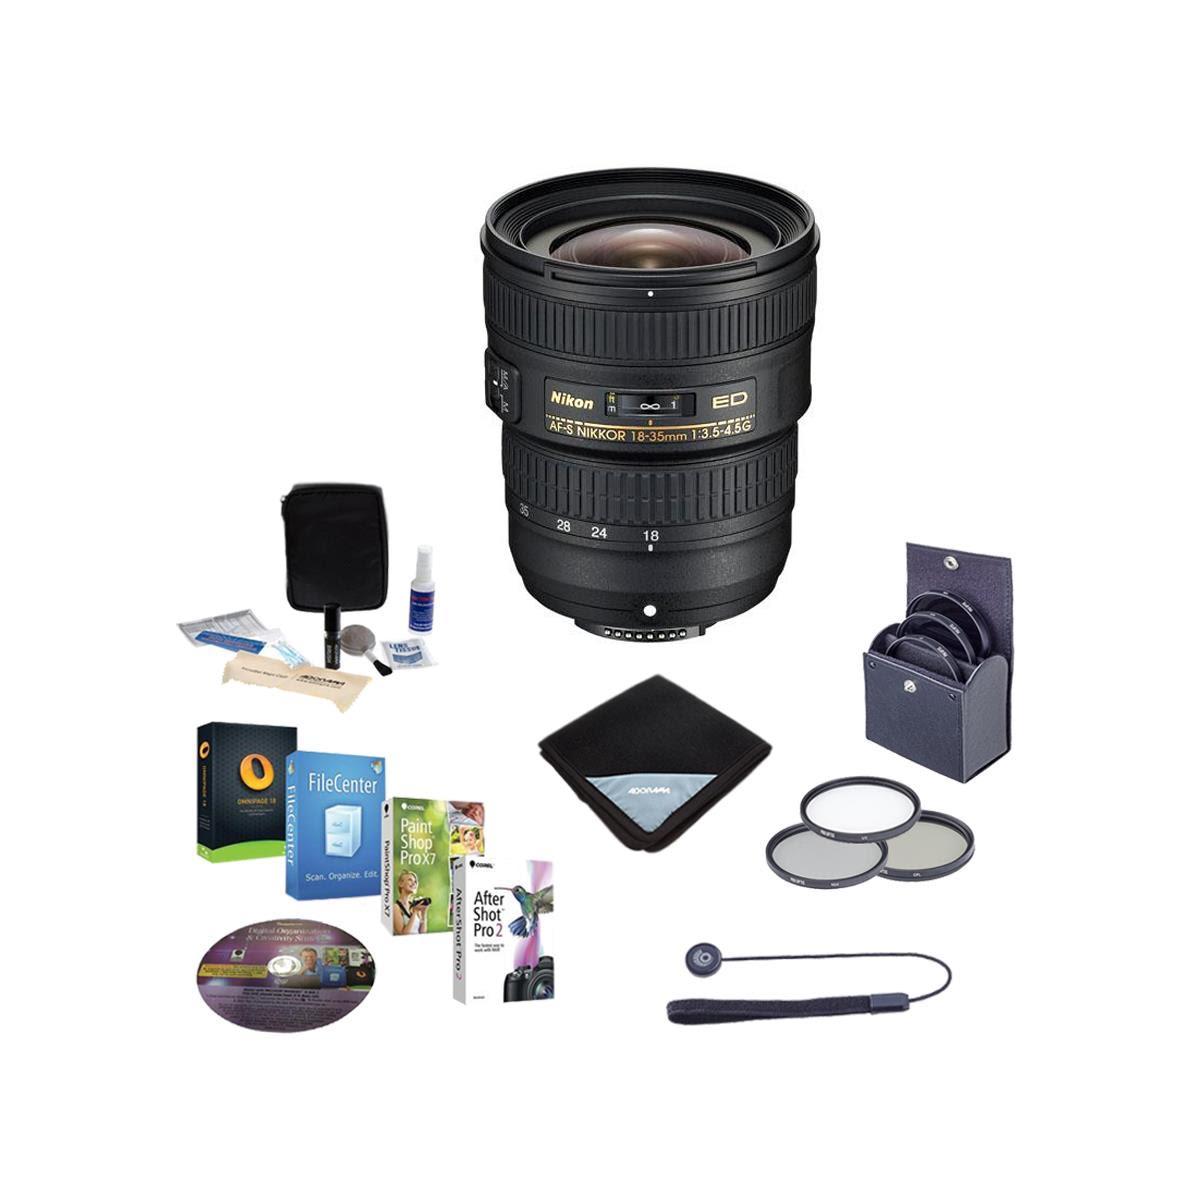 Nikon Lens Sale: 70-200mm f/2.8G $1897, 50mm f1.8 $197, 35mm f1.8  $177 & Many More + Free S&H